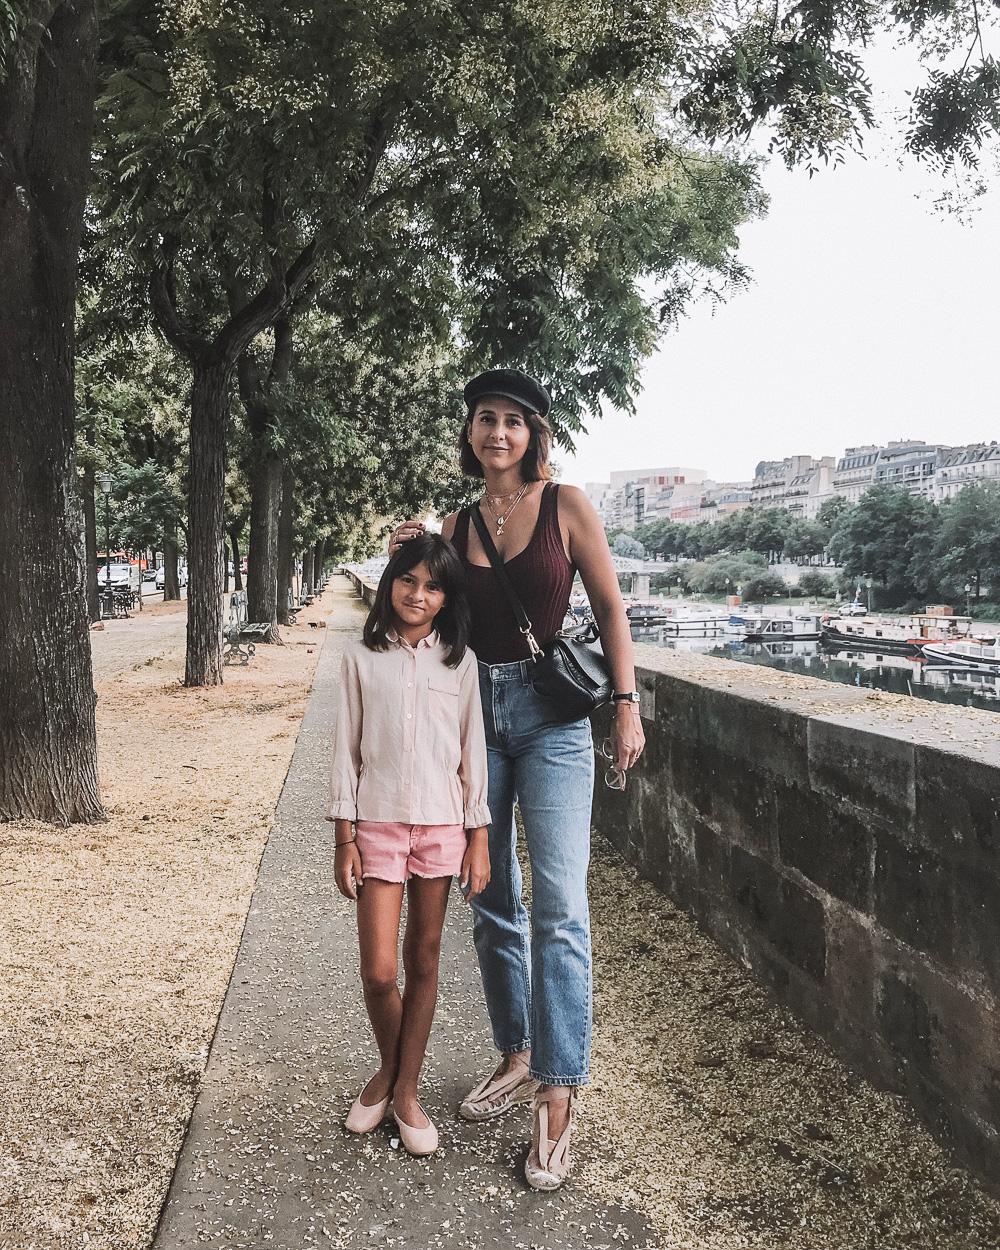 guia-rapida-de-paris-styleinlima-Facetune_24-07-2018-13-19-35